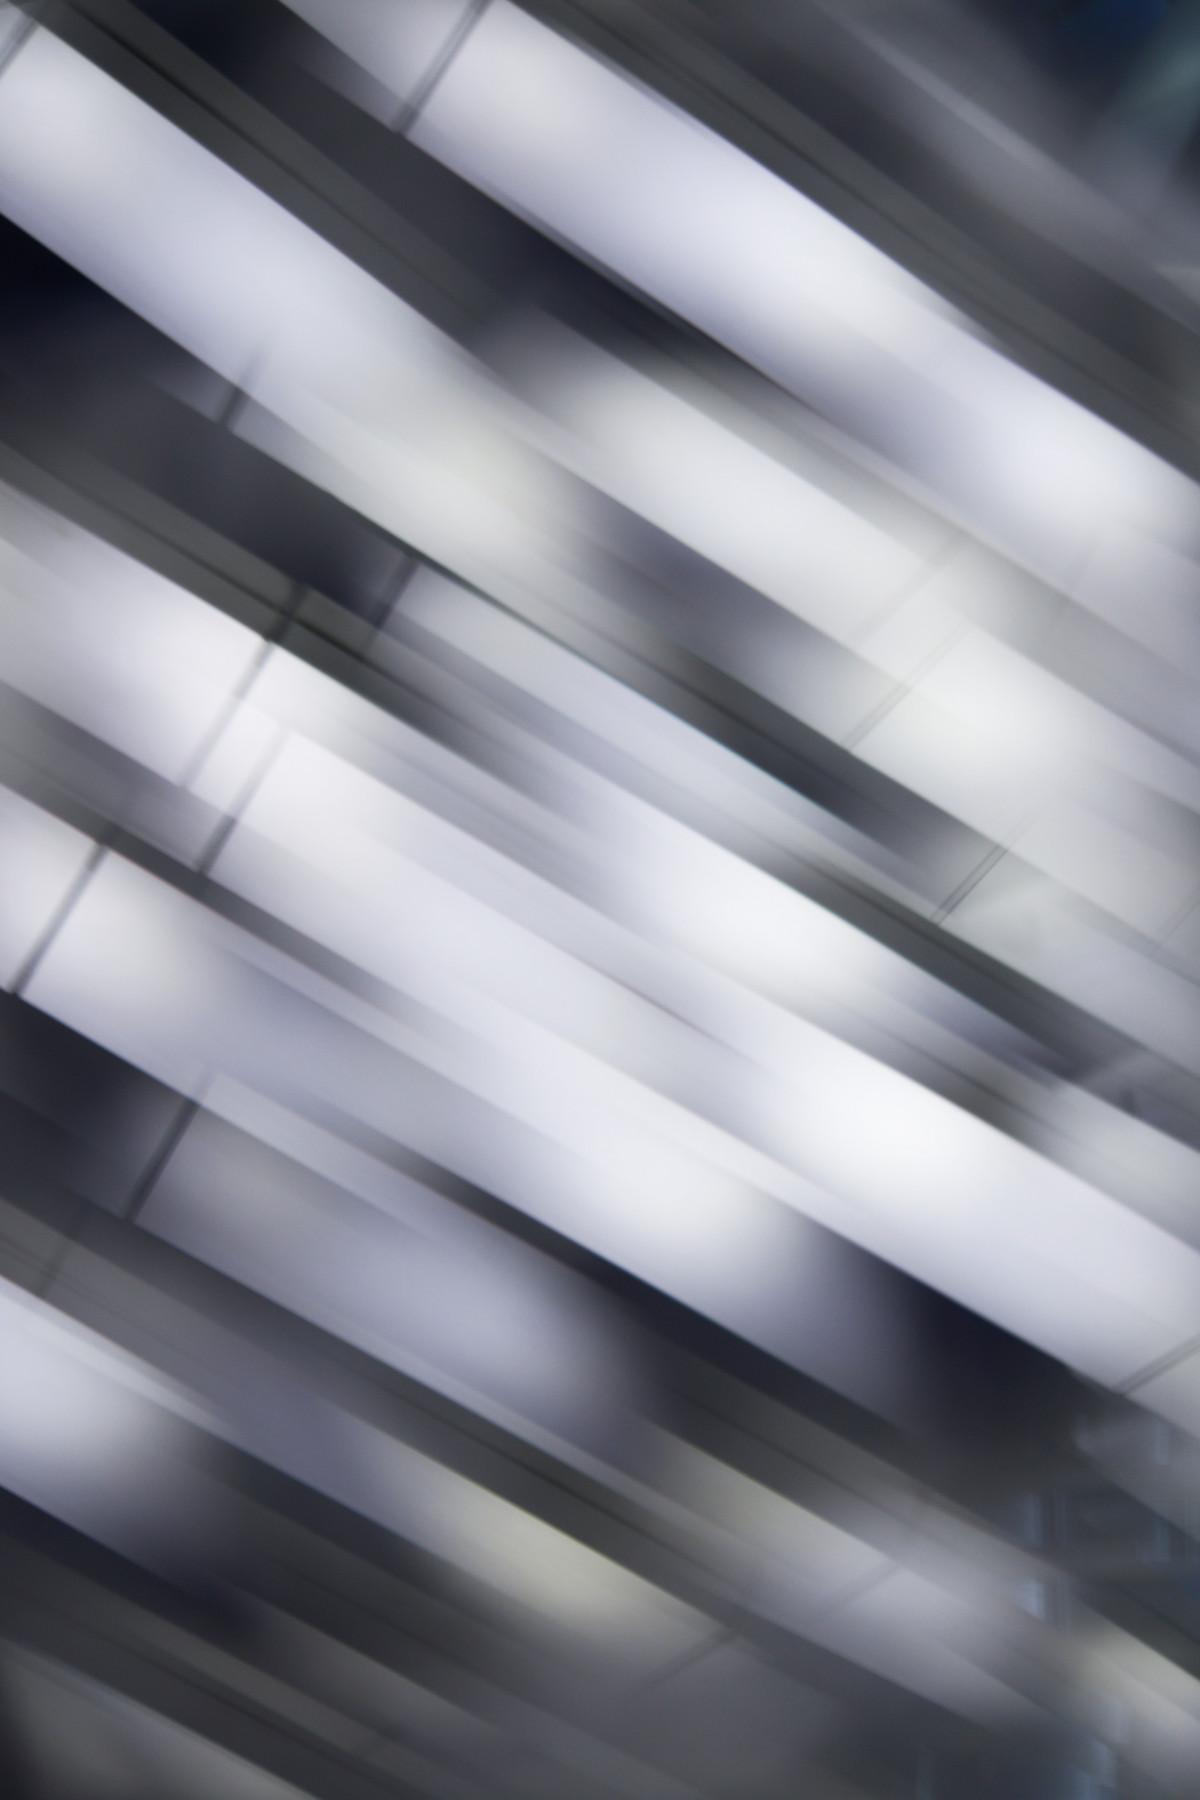 Dissolved Lisbon #05, photography, 100x70 cm. 2018